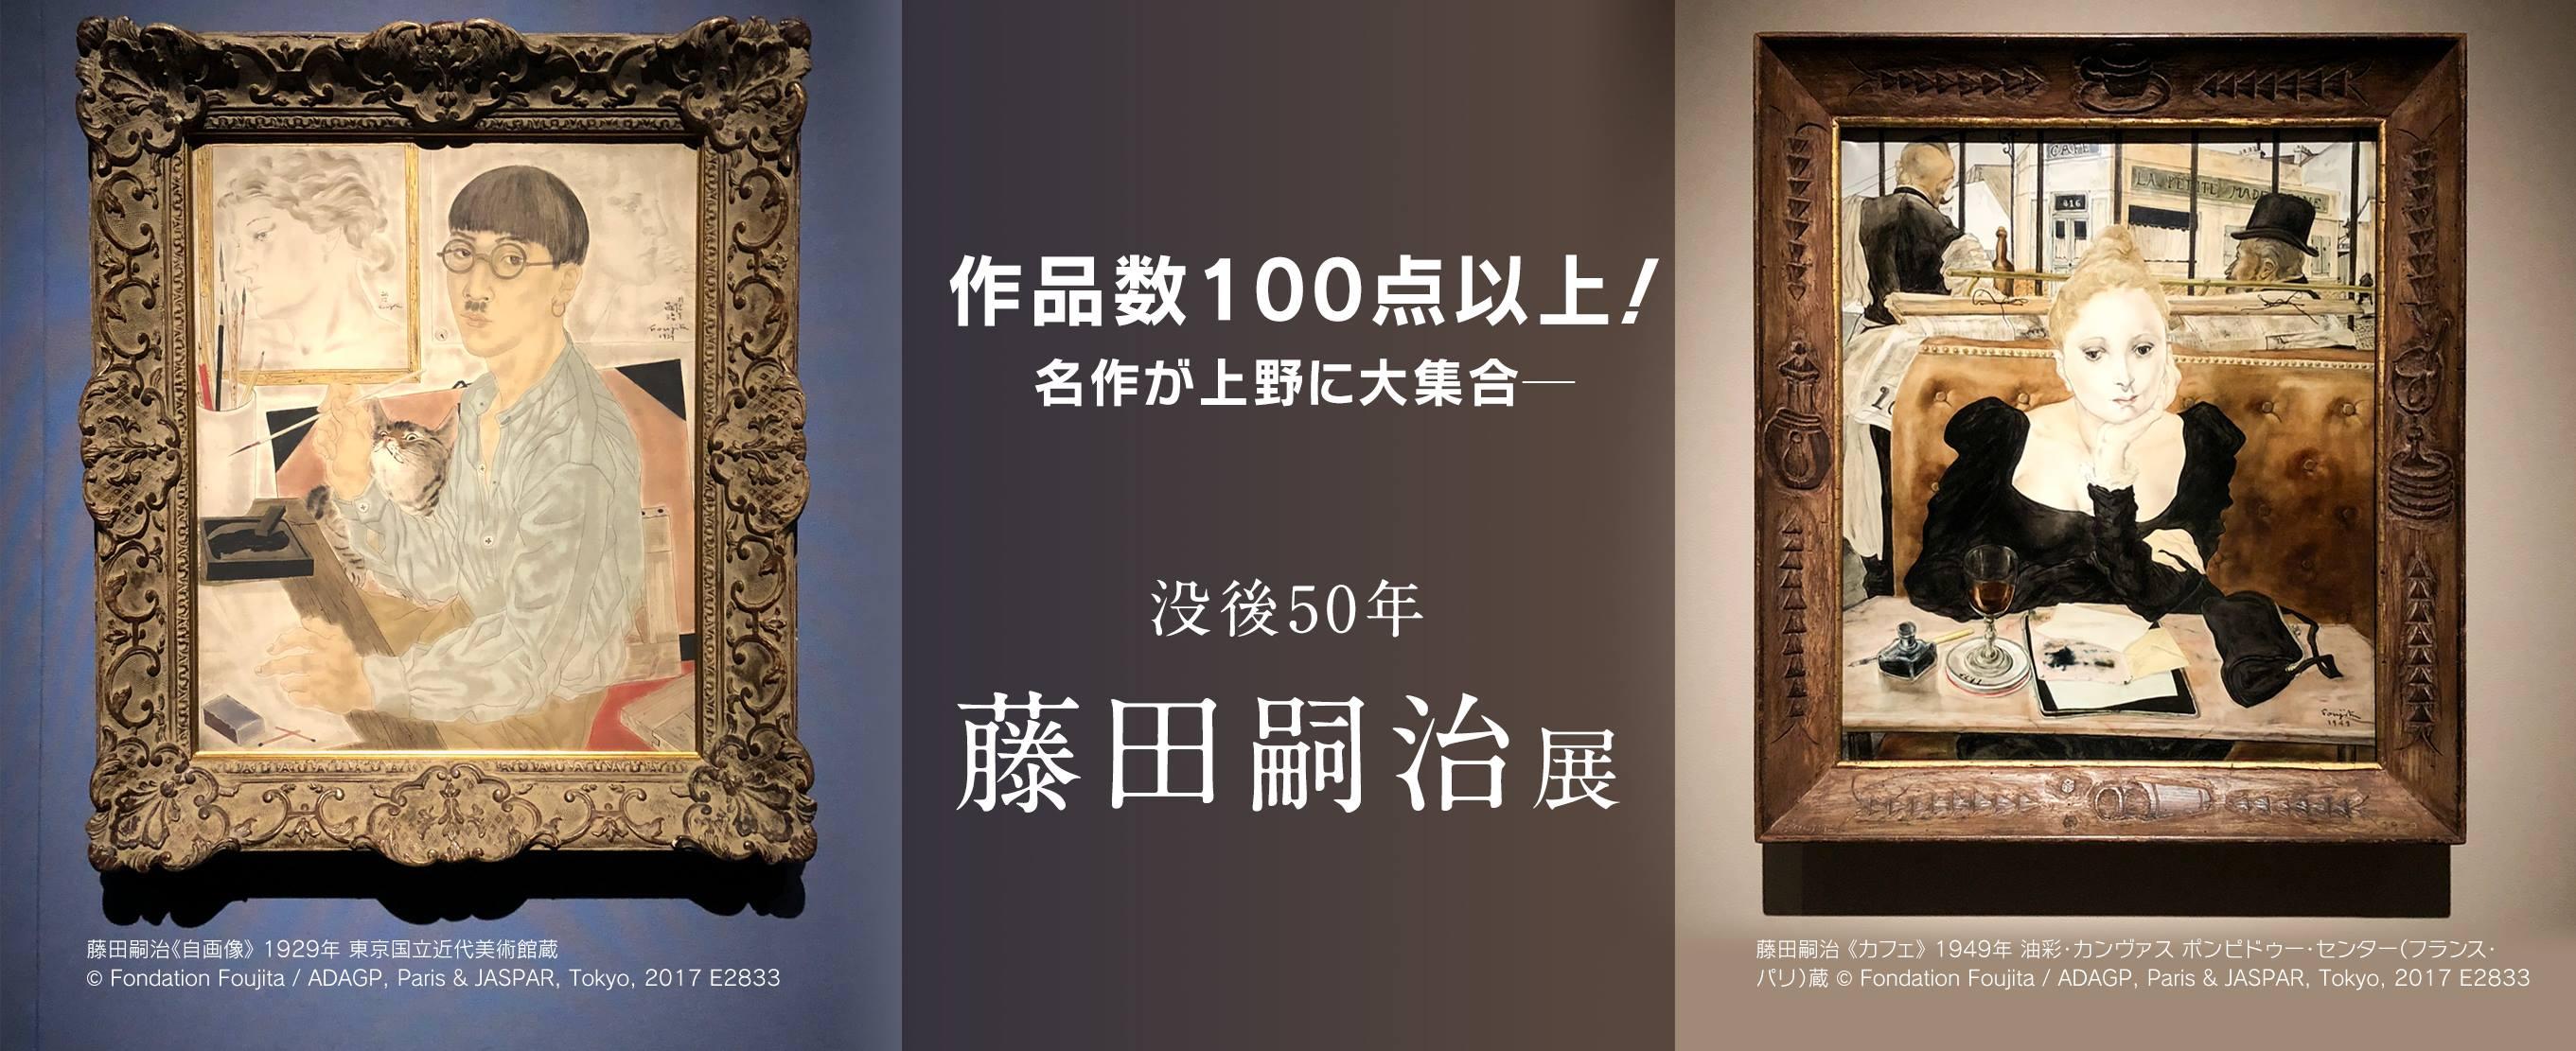 作品数100点以上!名作が上野に大集合ー『没後50年 藤田嗣治展』